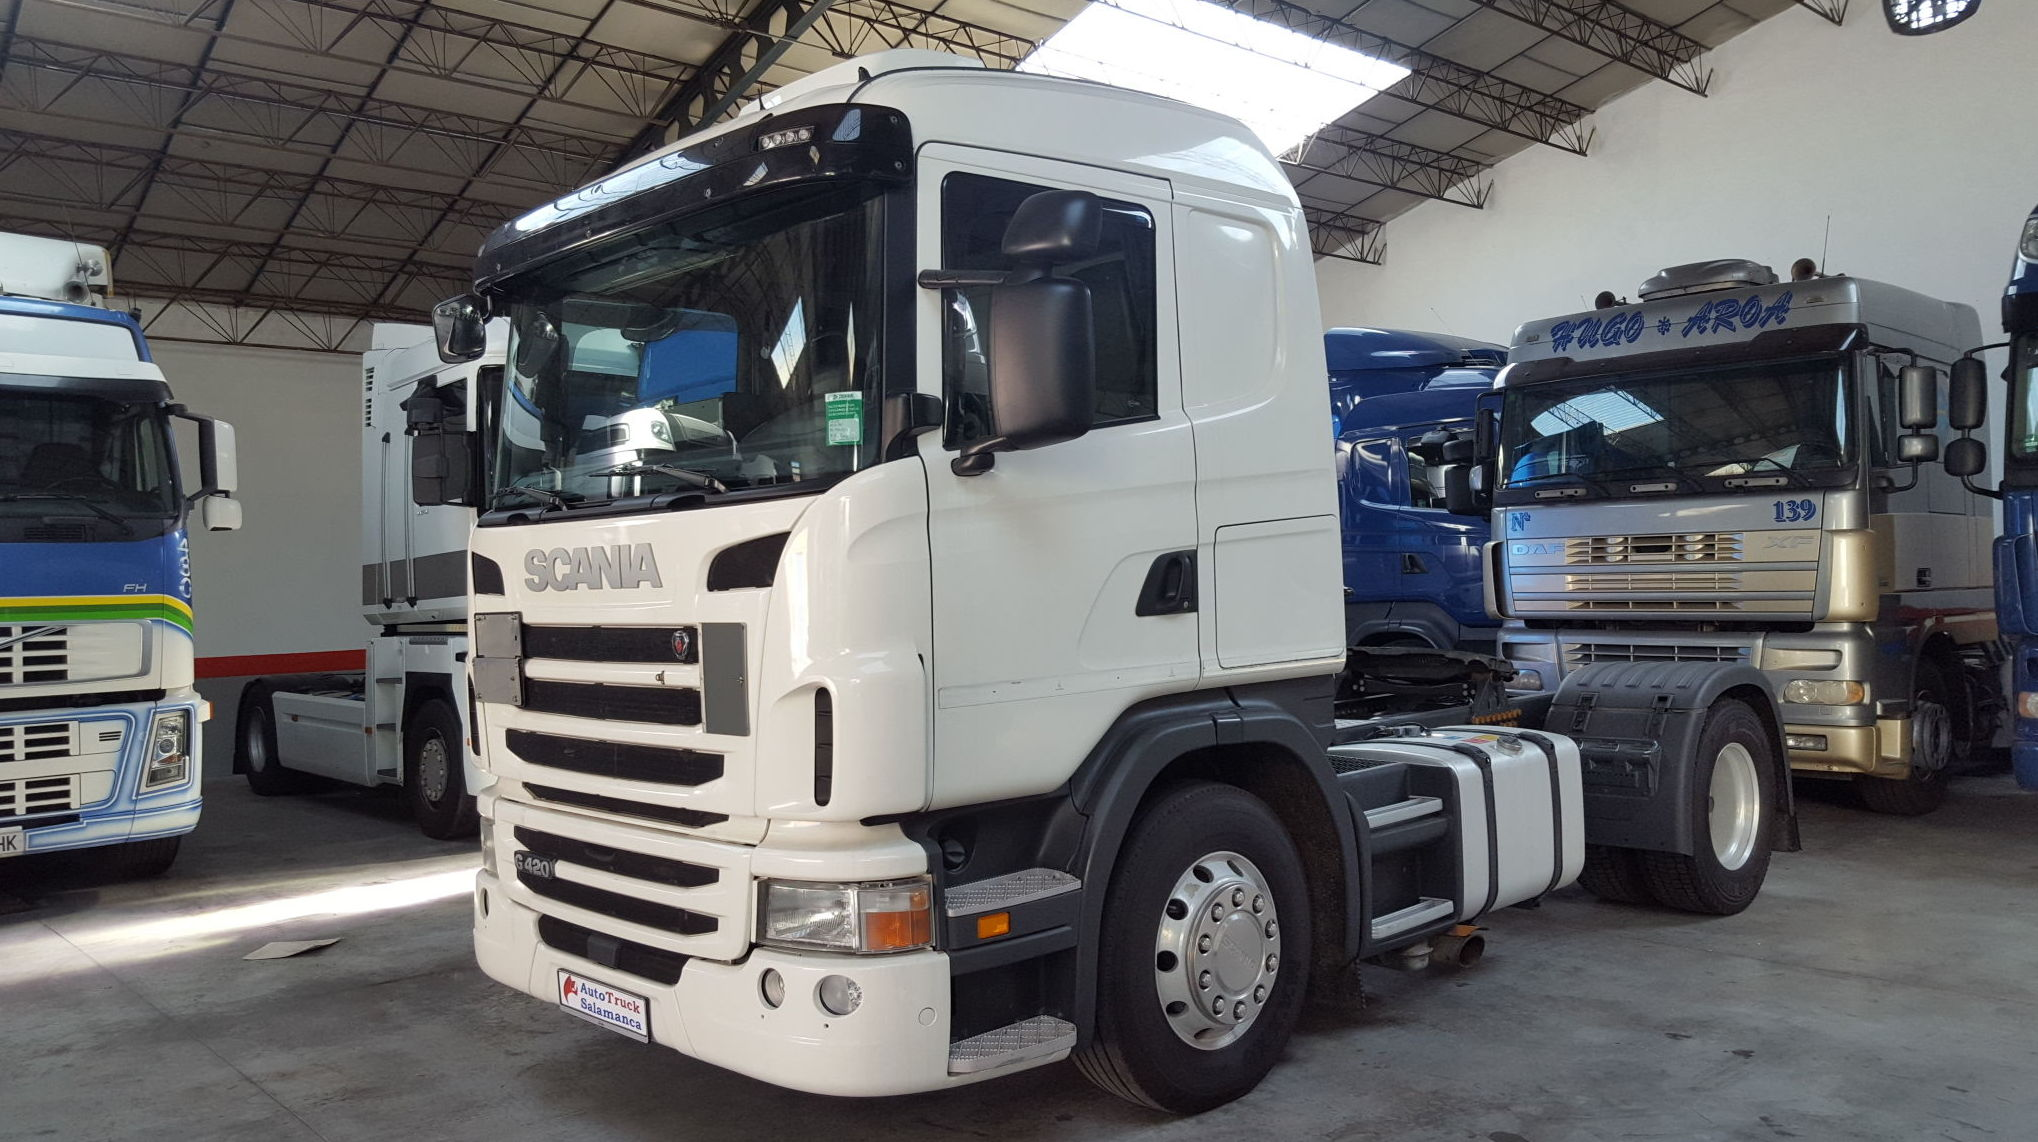 Foto 10 de Camiones en Villares de la Reina   Autotruck Salamanca